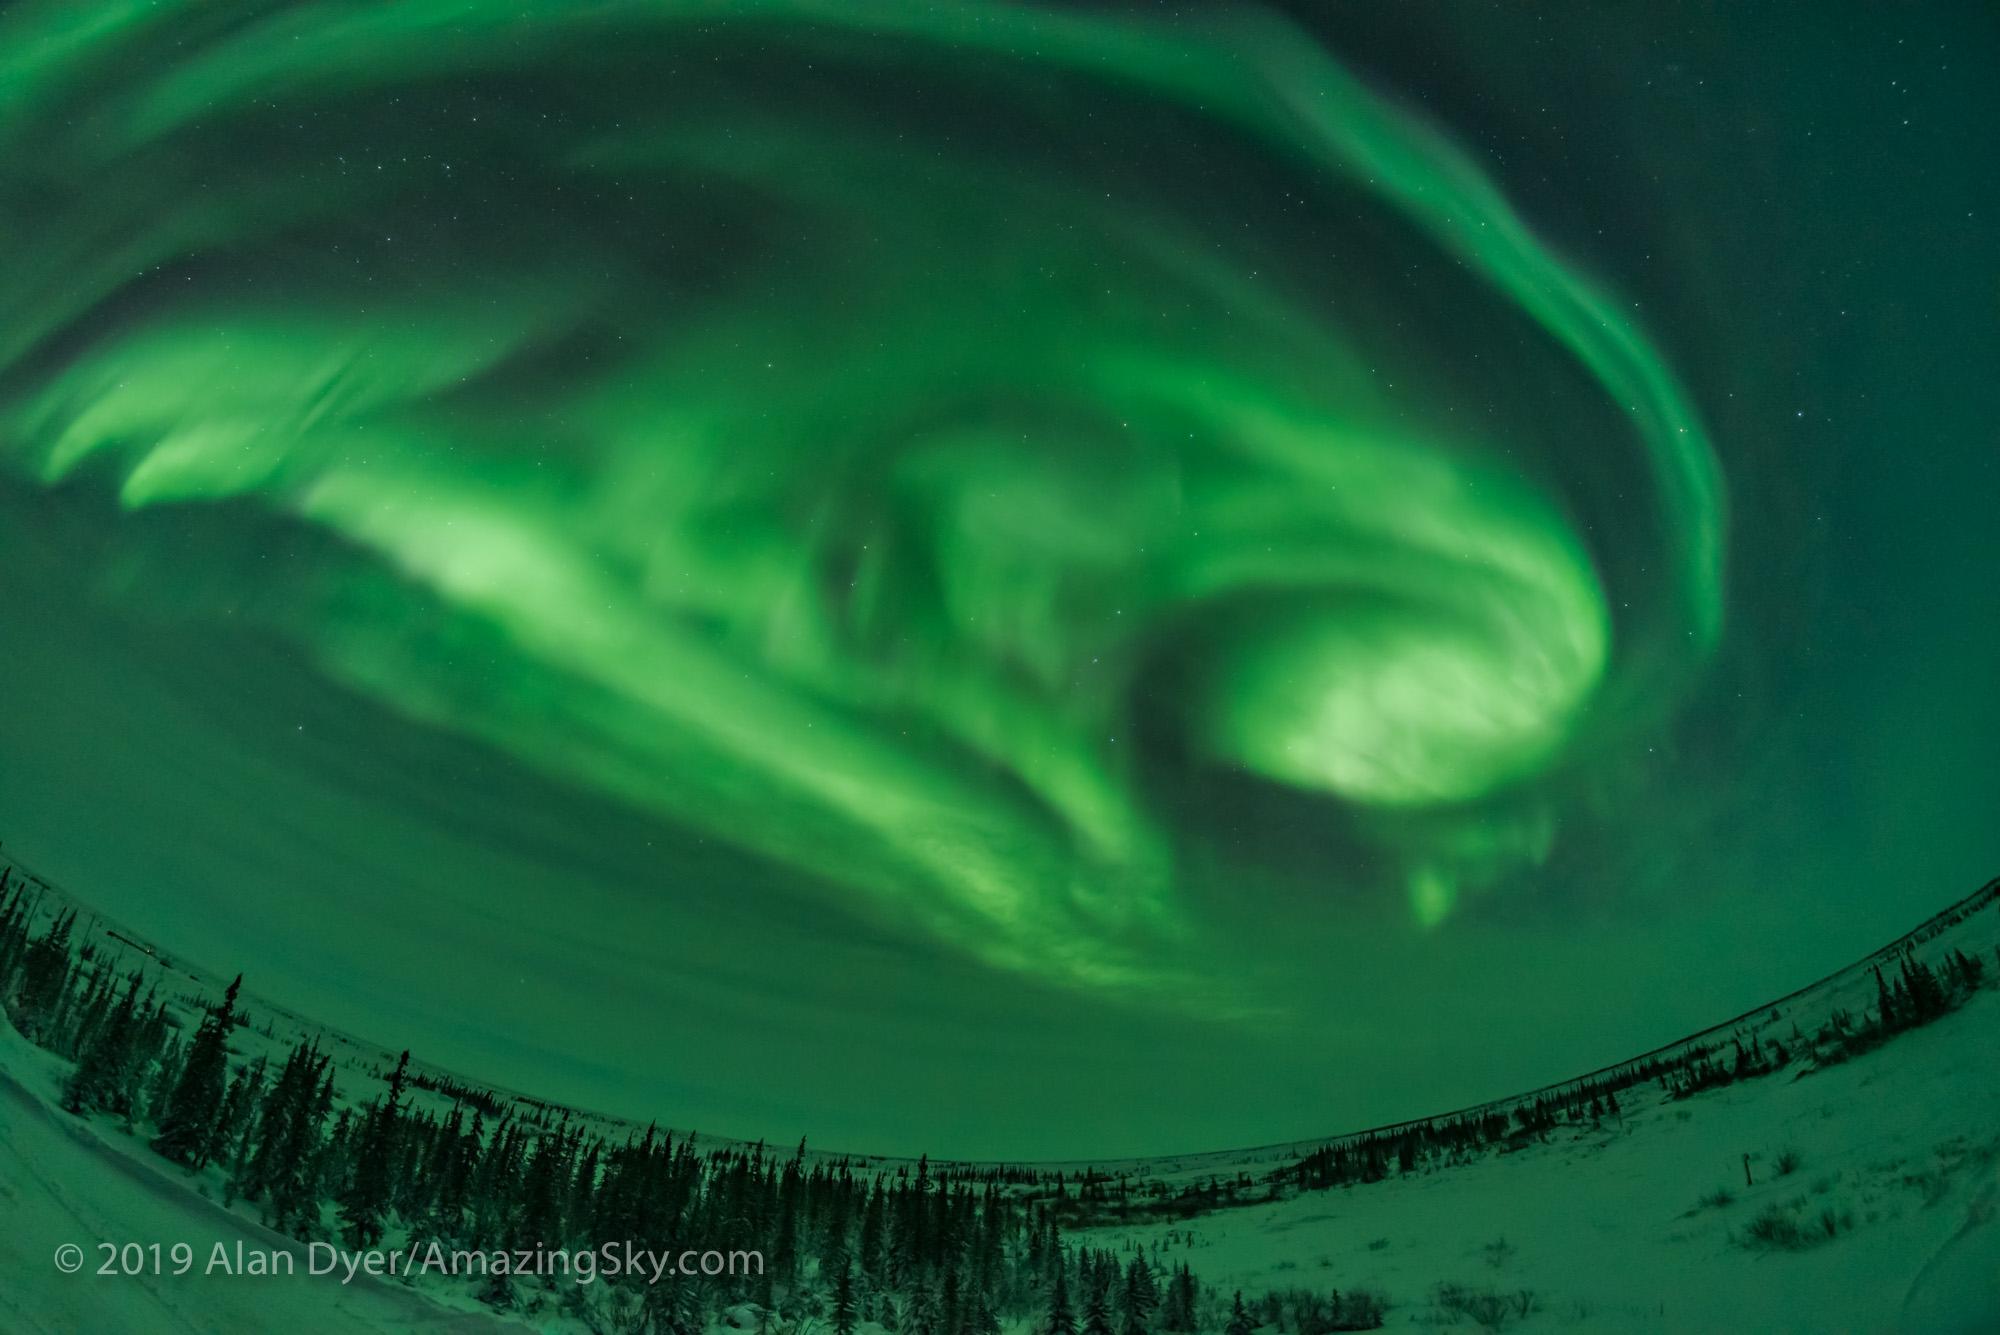 Auroral Arcs, Loops and Swirls (Feb 5, 2019) #5 of 5